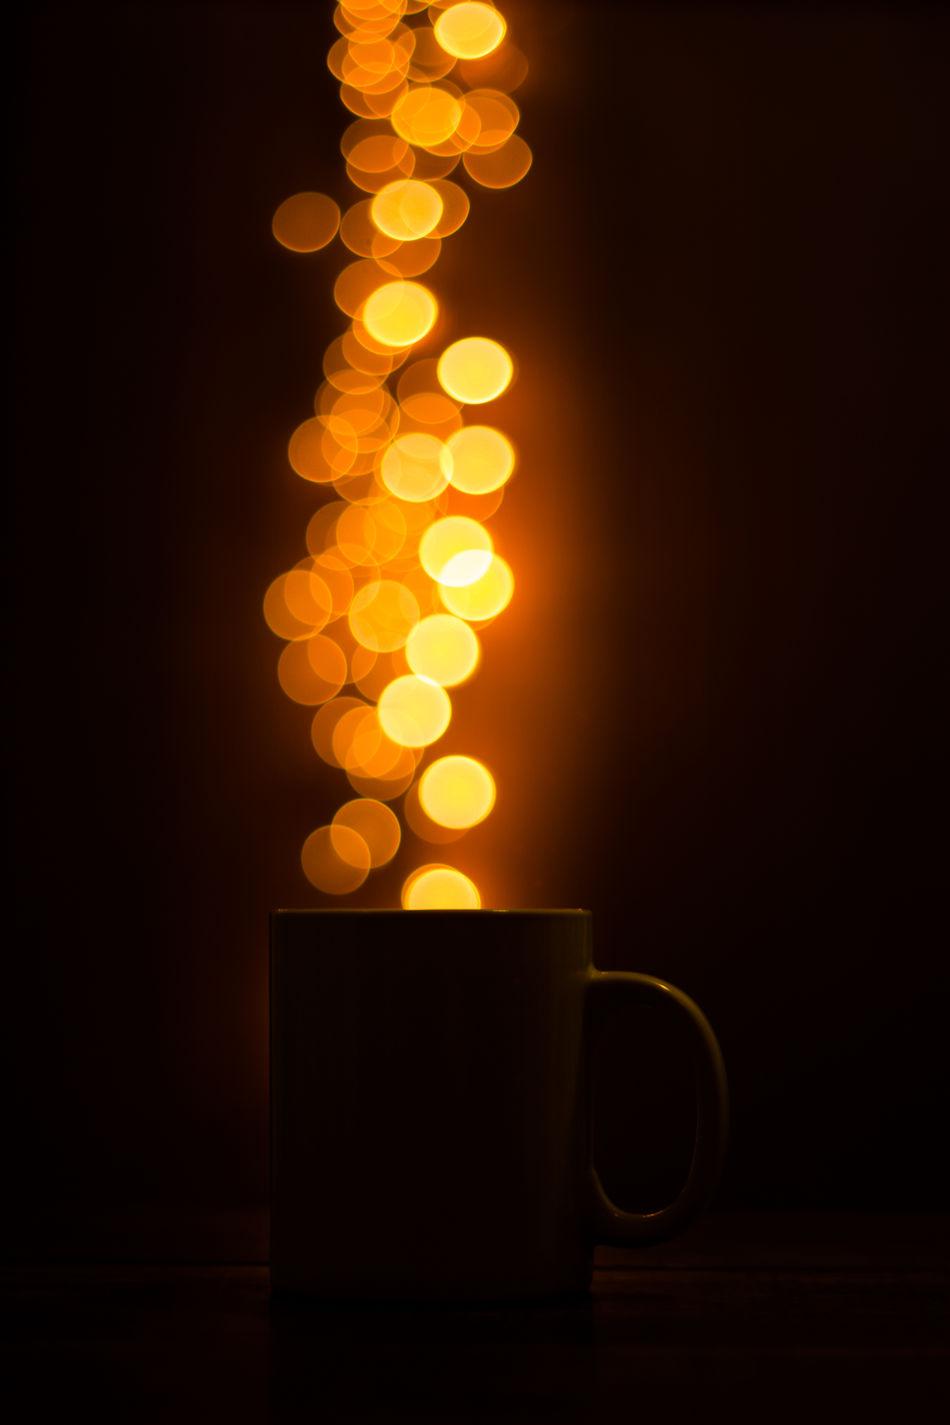 Black Background Bokeh Bokeh Photography Close-up Coffee Cup Darkroom Heat - Temperature Hot Coffee Illuminated Light Magic Coffee Still Life Warm